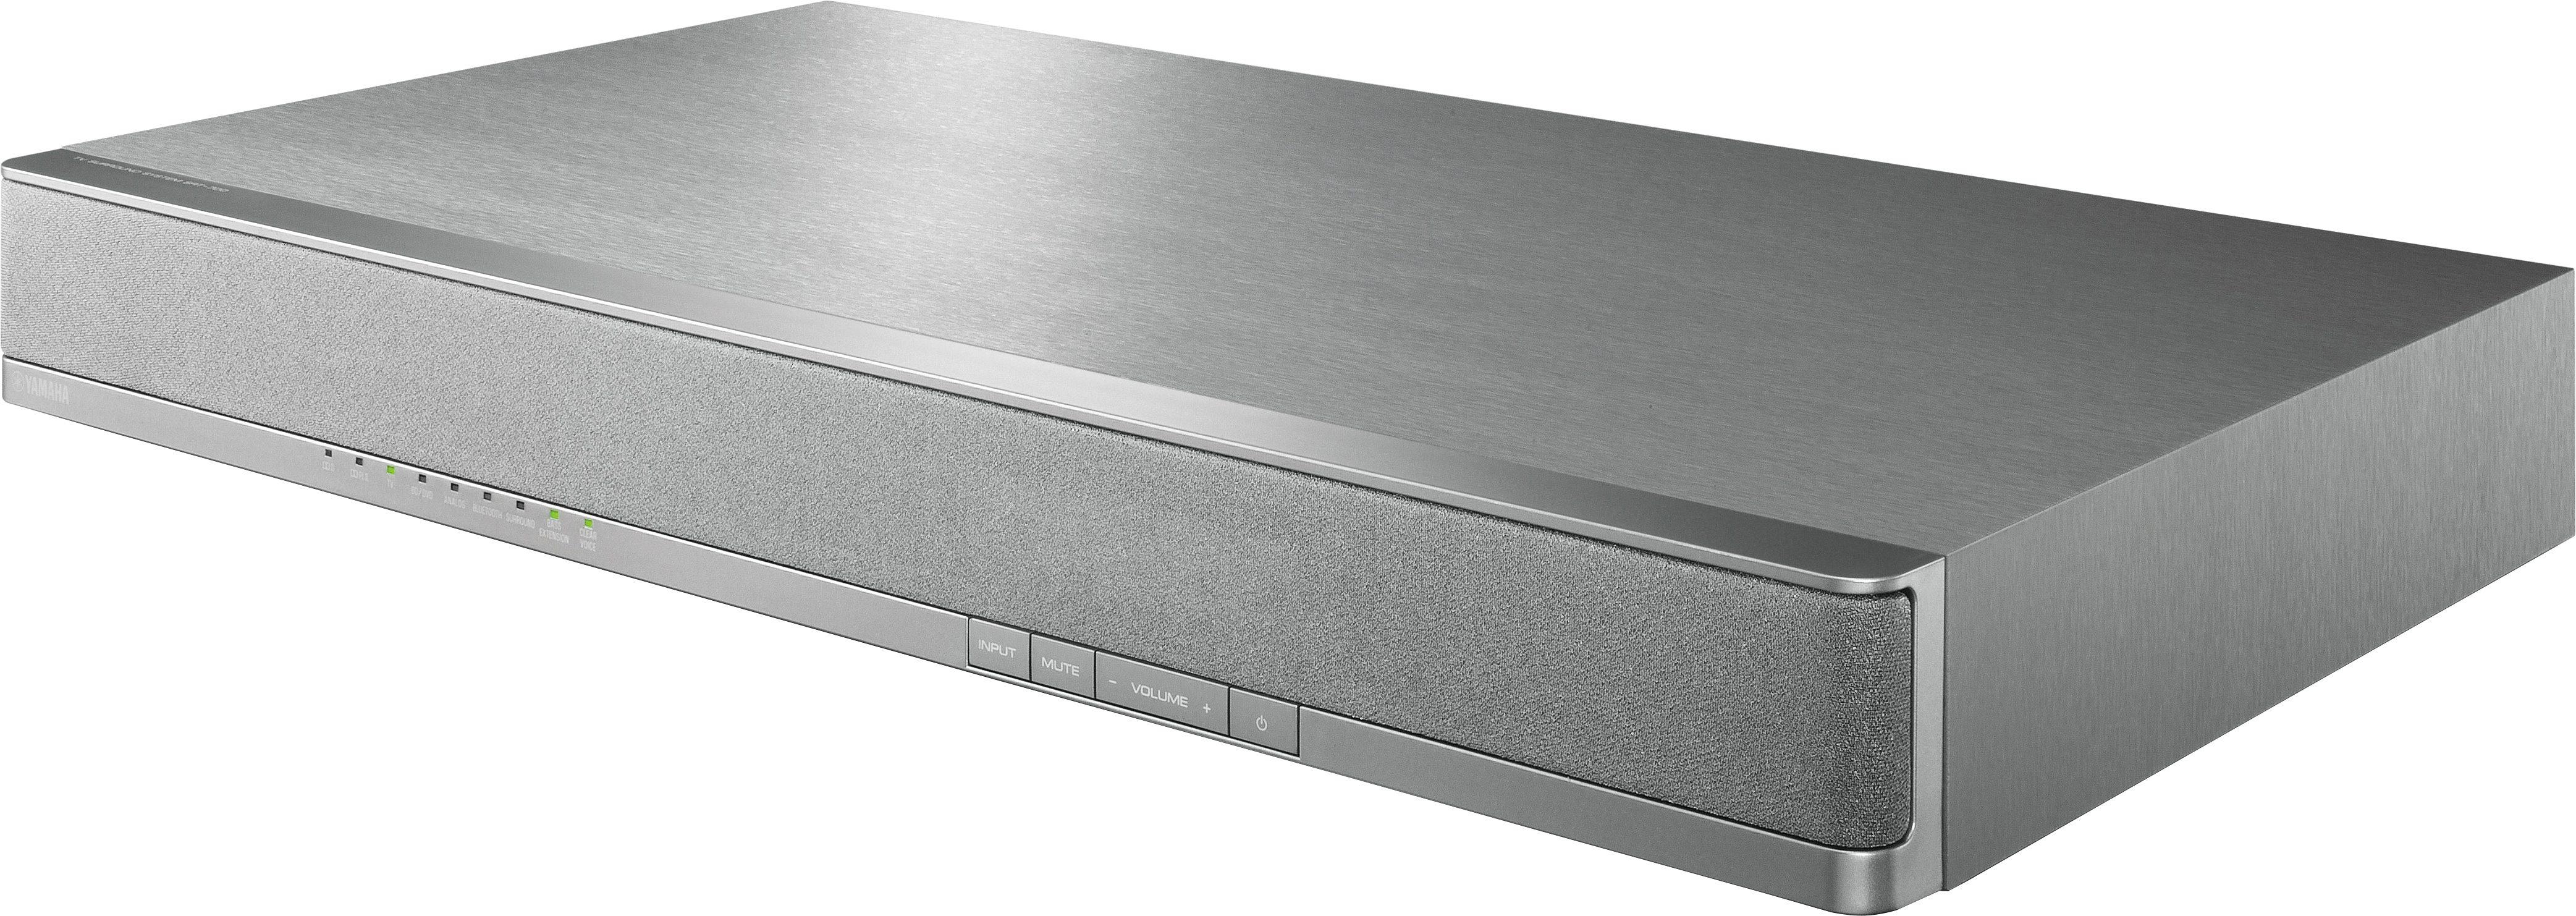 Yamaha SRT-700 Soundbar mit Bluetooth